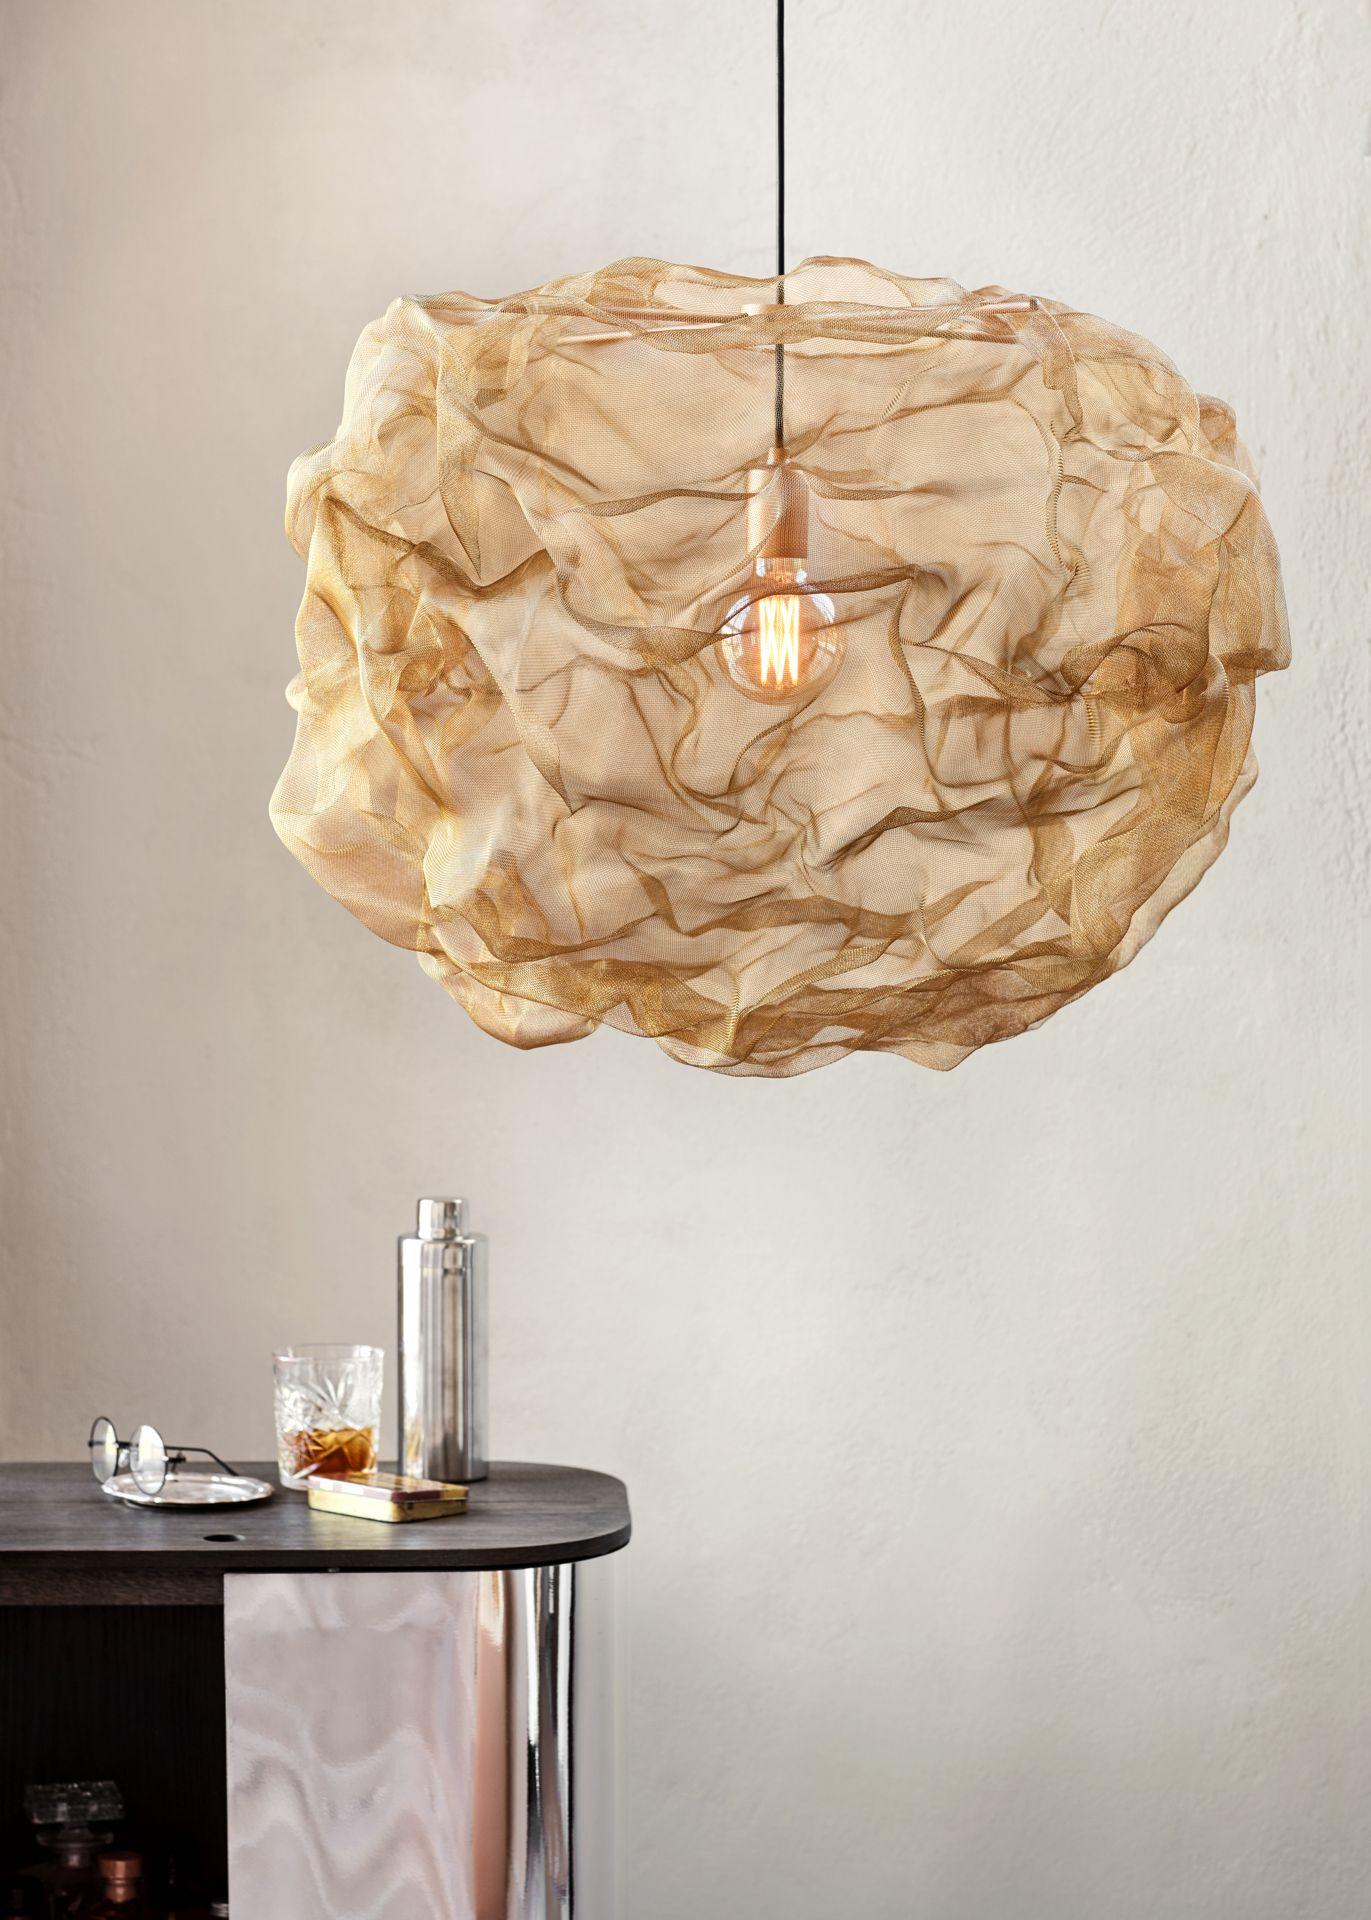 Beau Suspension Heat. Northern Lighting Devient Northern, Une Nouvelle Marque De  Mobilier Indoor. | Modern Living Blog